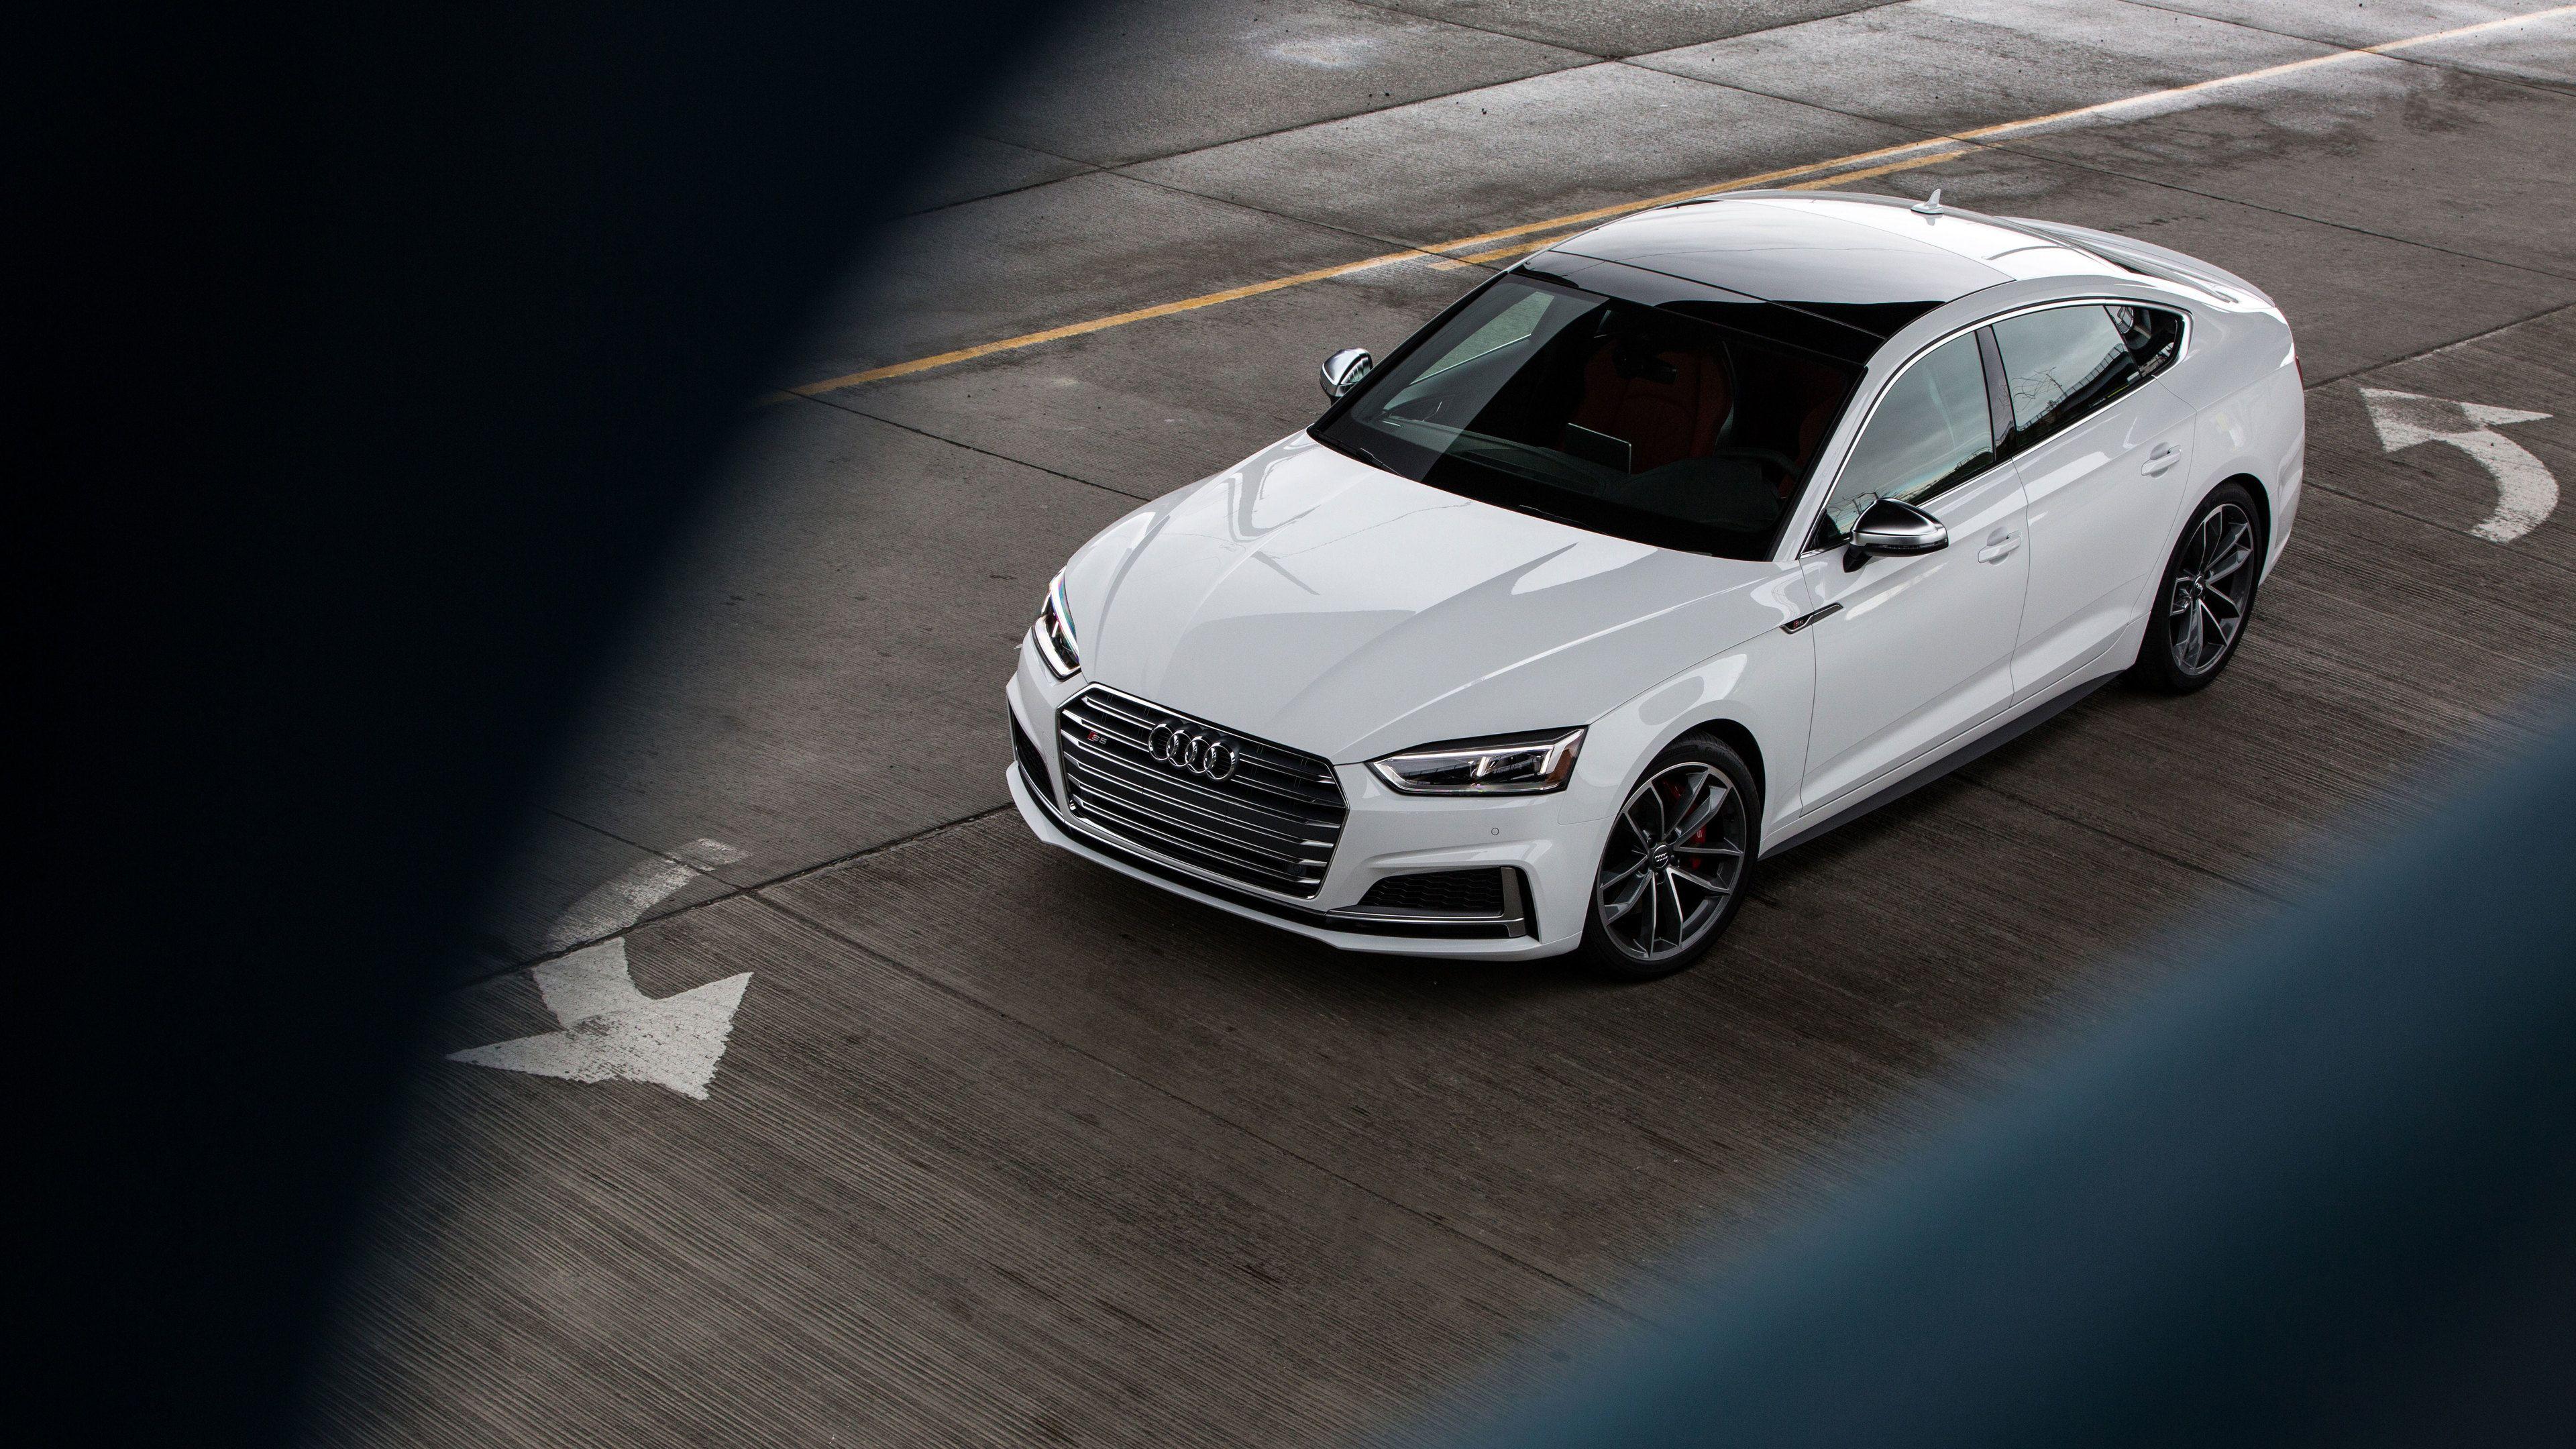 2018 Audi S5 Sportback Hd Wallpapers Cars Wallpapers Audi Wallpapers 5k Wallpapers 4k Wallpapers 2018 Cars Wallpapers Audi S5 Audi S5 Sportback Audi A5